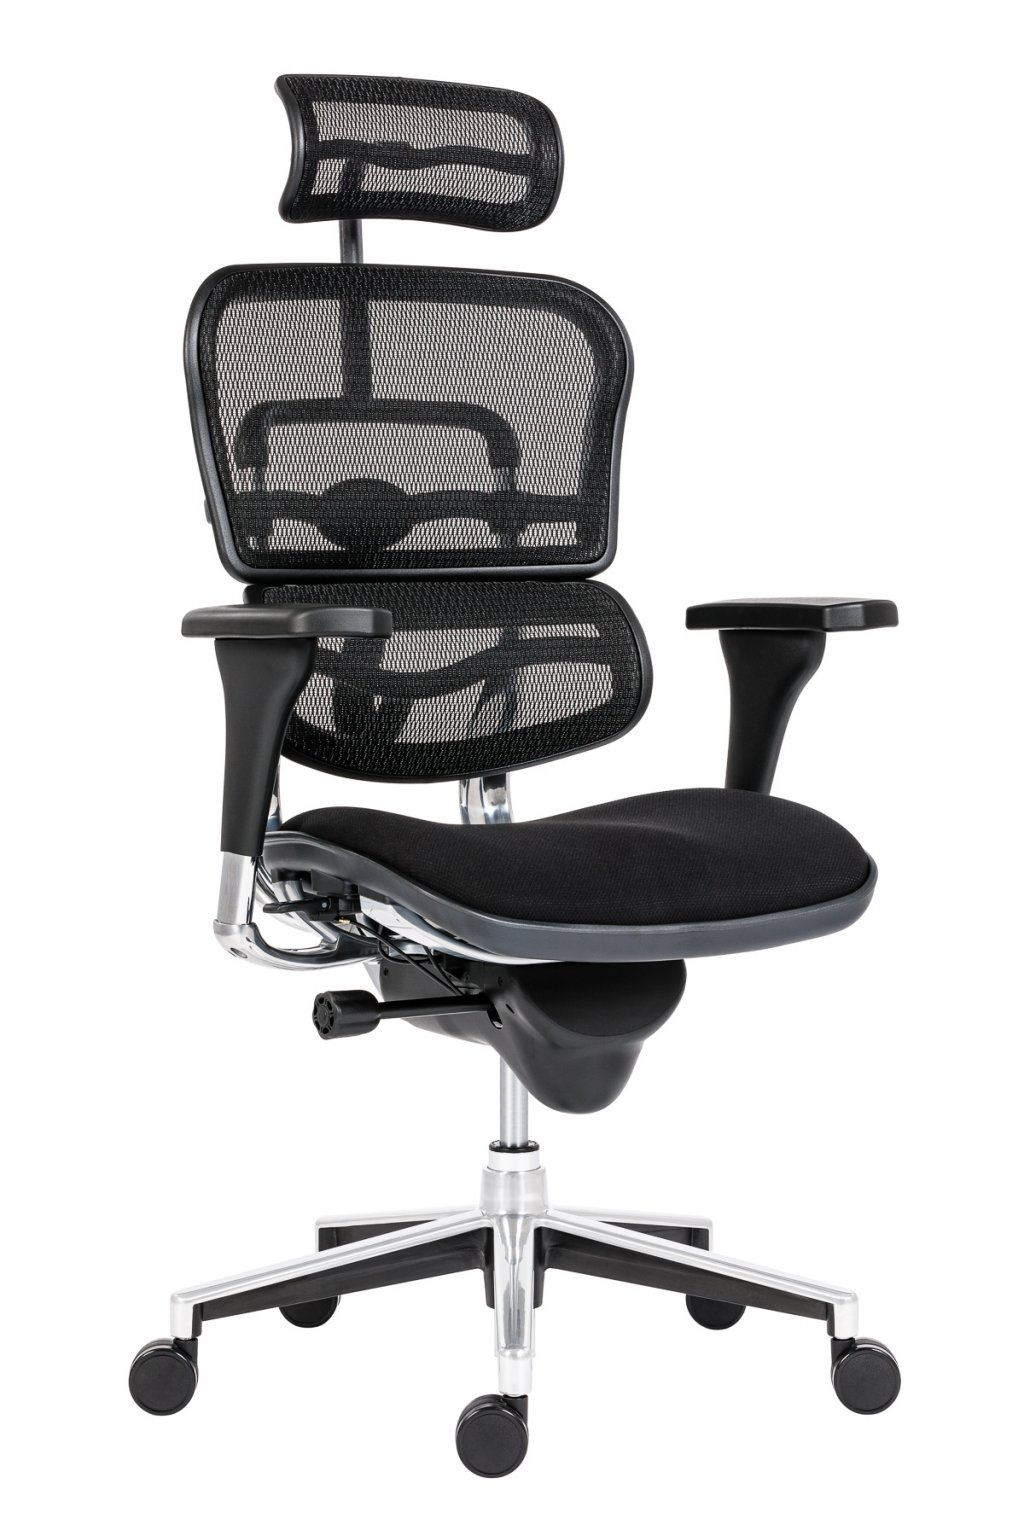 Ergohuman seat UPH 003